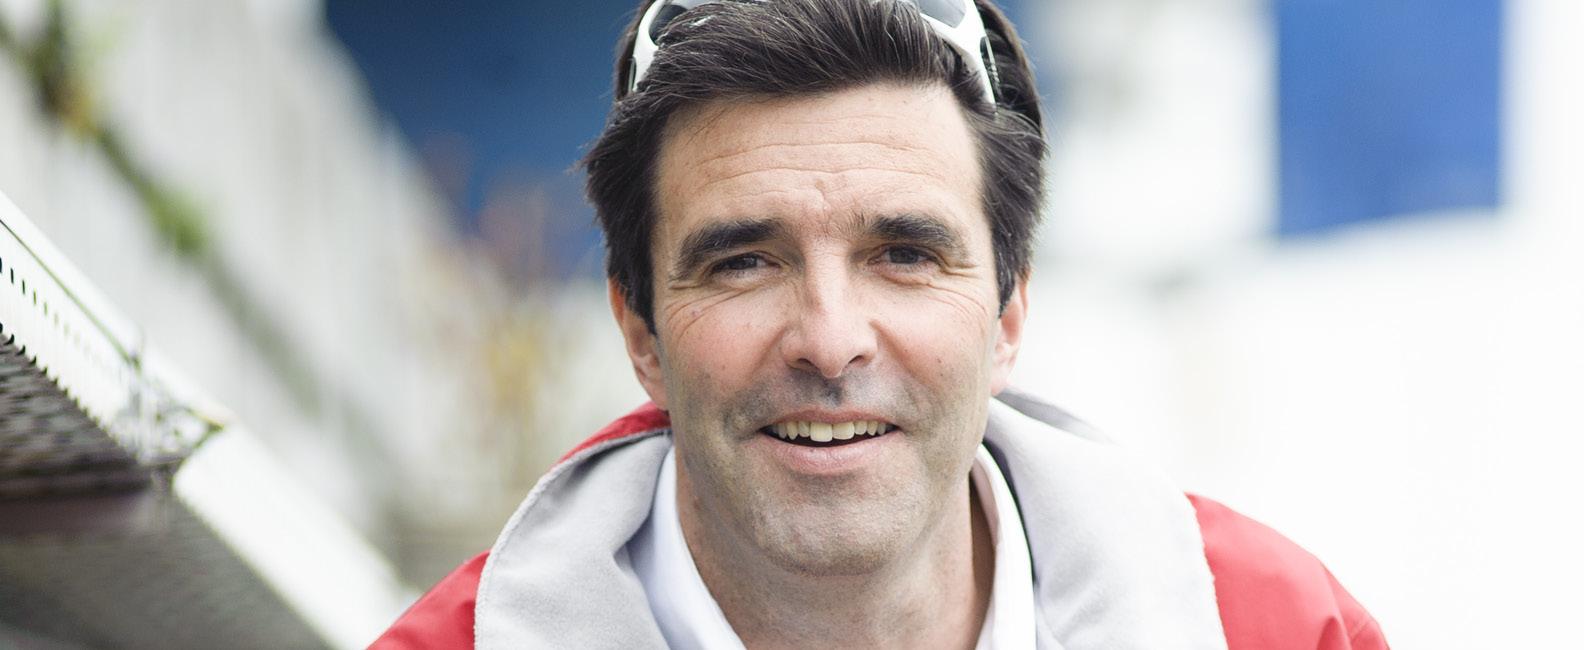 Le skipper belge innove en rêvant du Vendée Globe